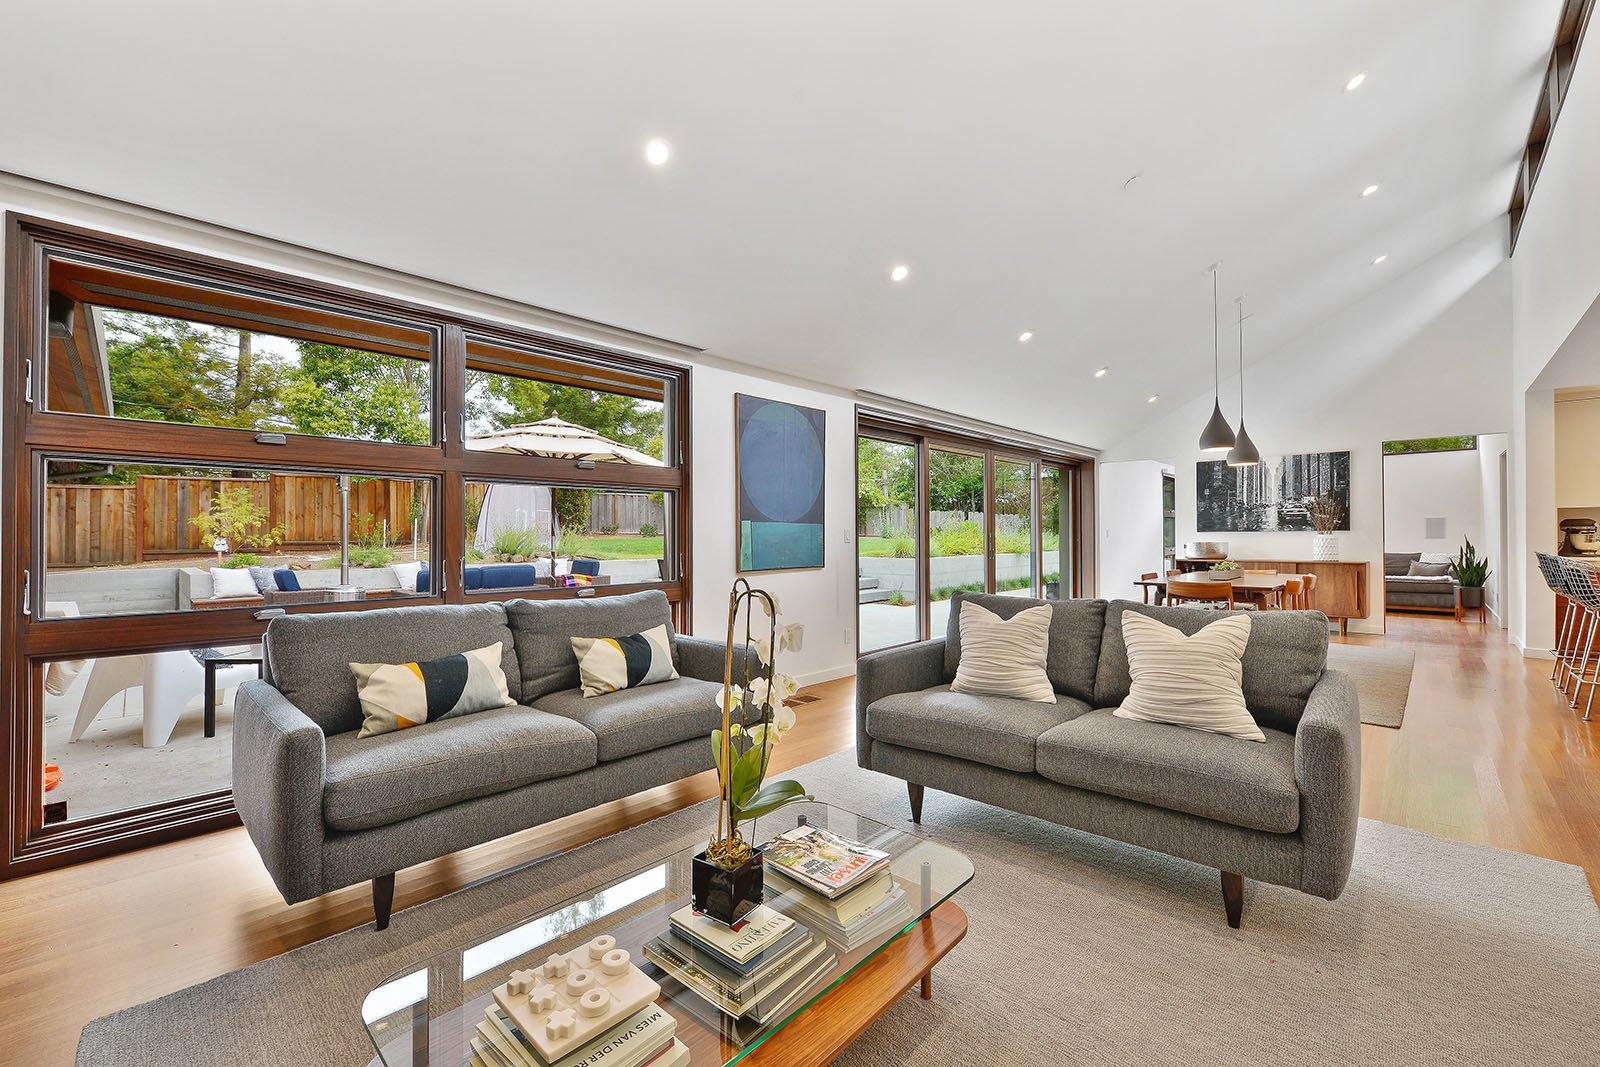 Living Room, Coffee Tables, Pendant Lighting, Sofa, Ceiling Lighting, and Medium Hardwood Floor Living room  Portola Valley by patrick perez/designpad architecture